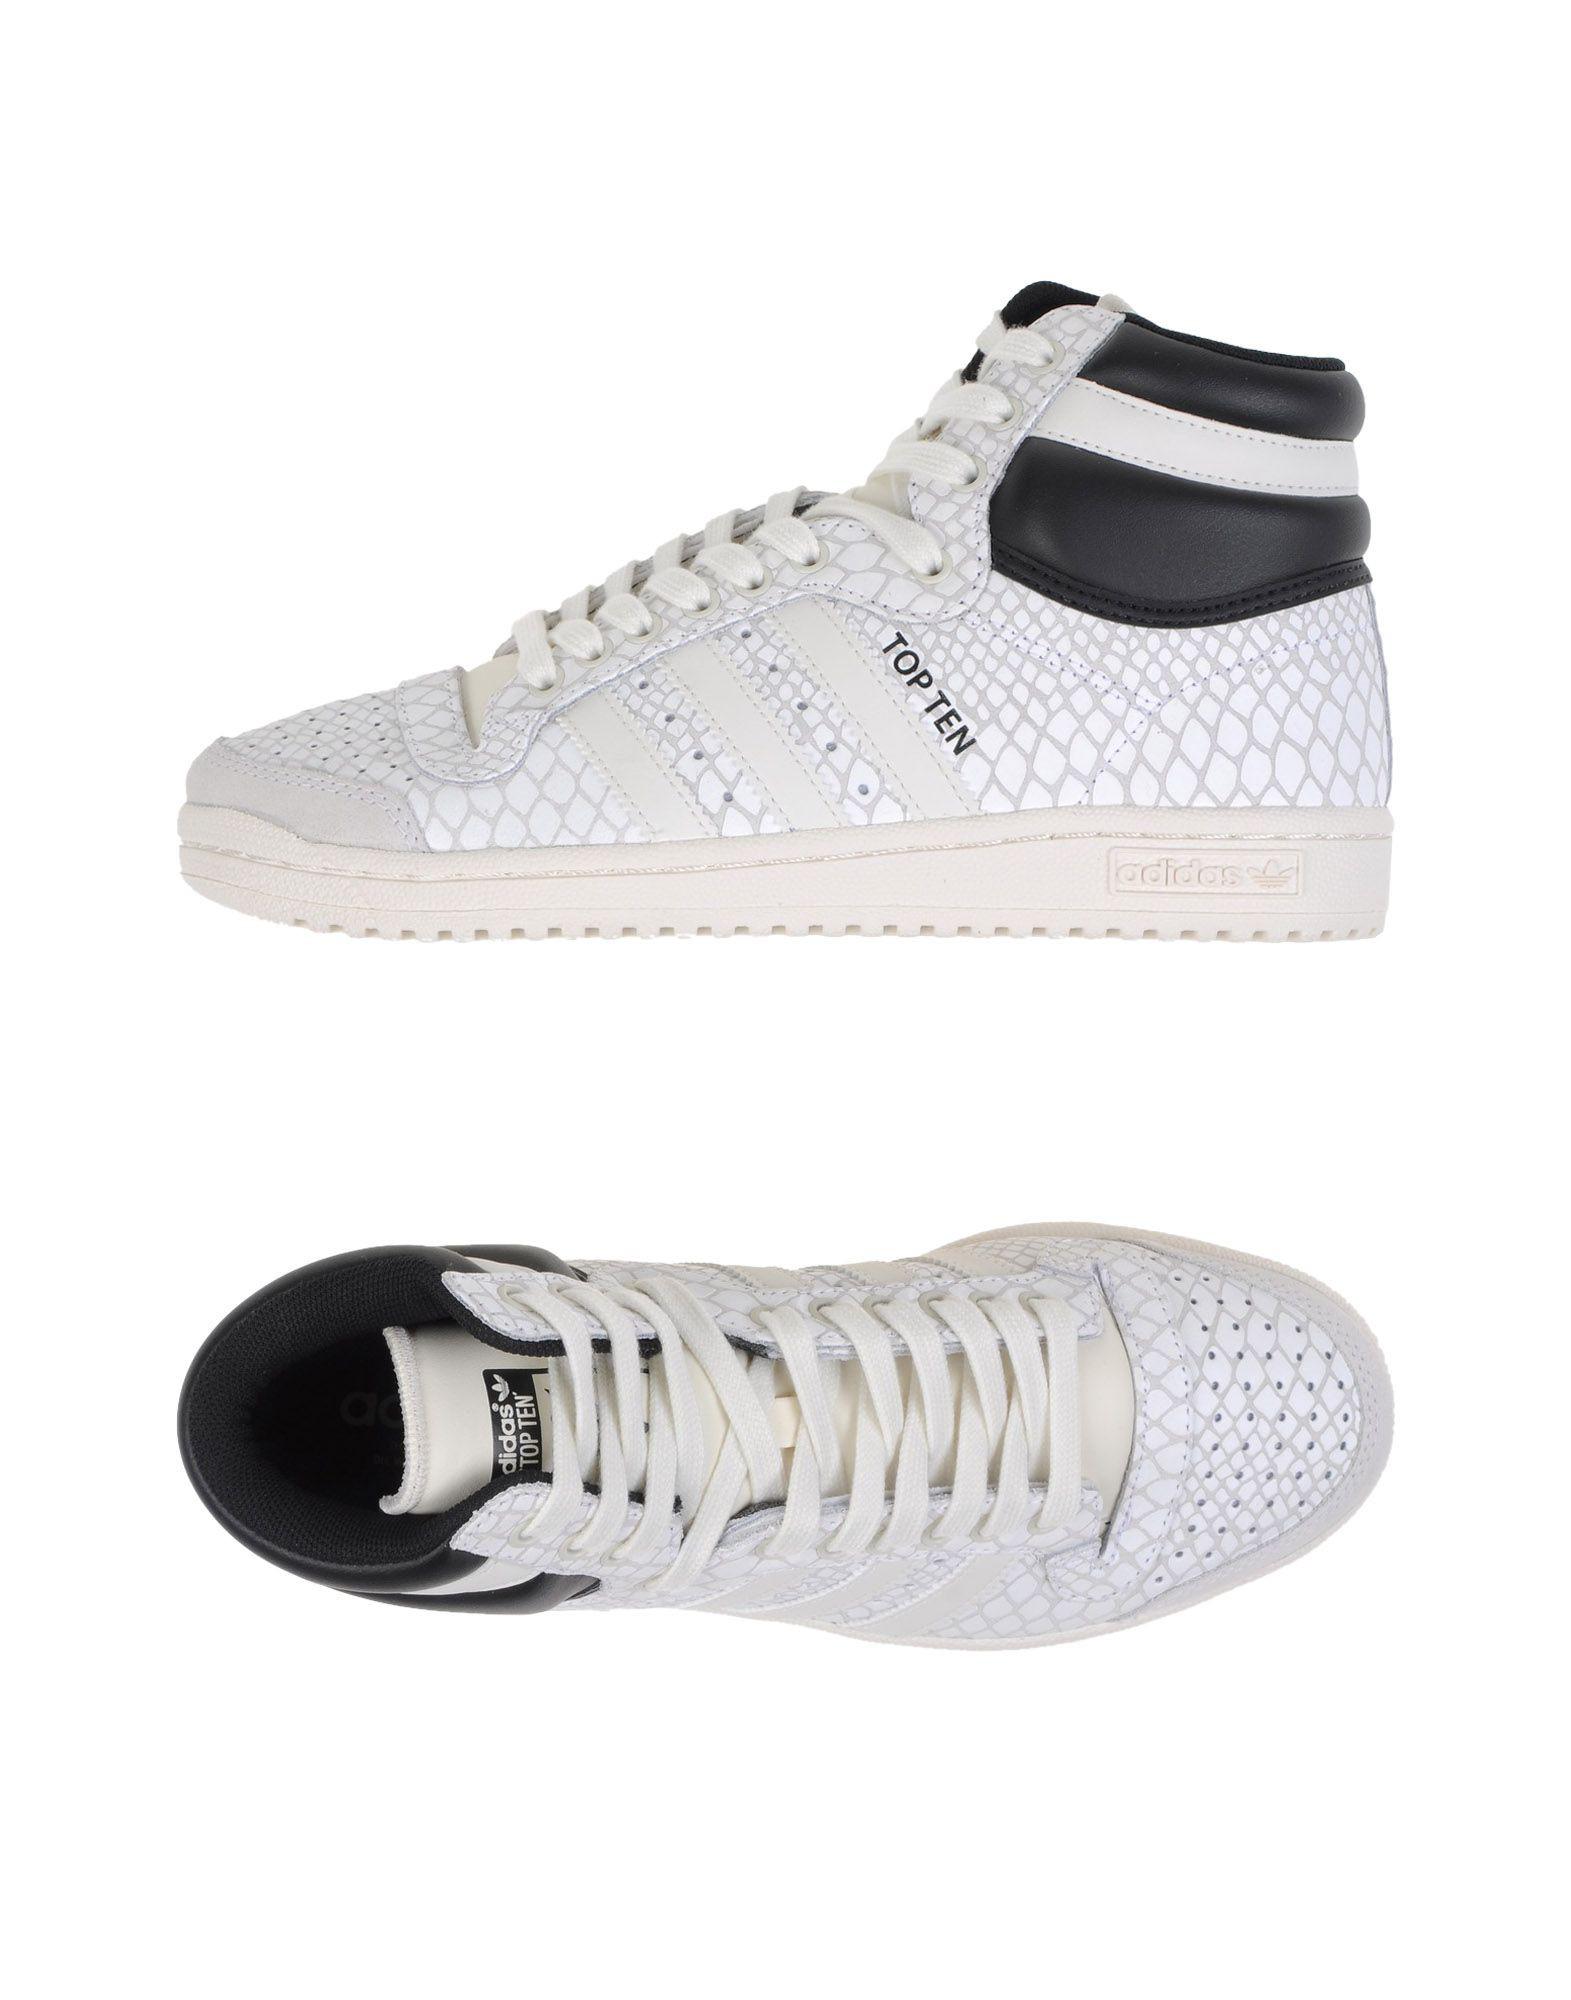 adidas pas cher chine, adidas Chaussures Baskets Superstar